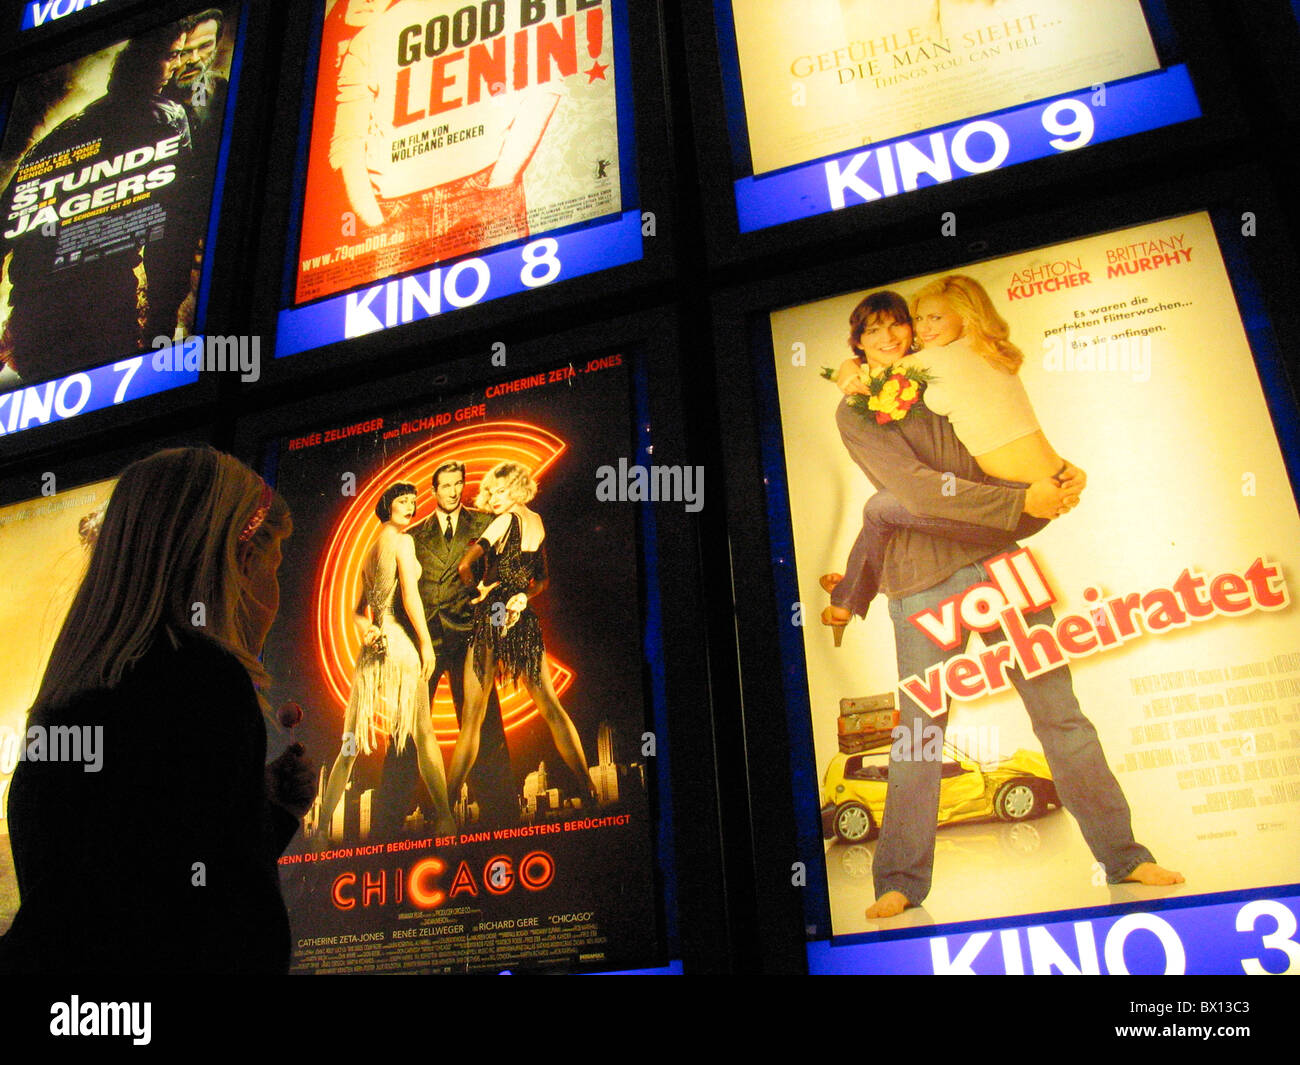 exit film film poster films girl model released movie movies Movies offer poster poster wall supply - Stock Image